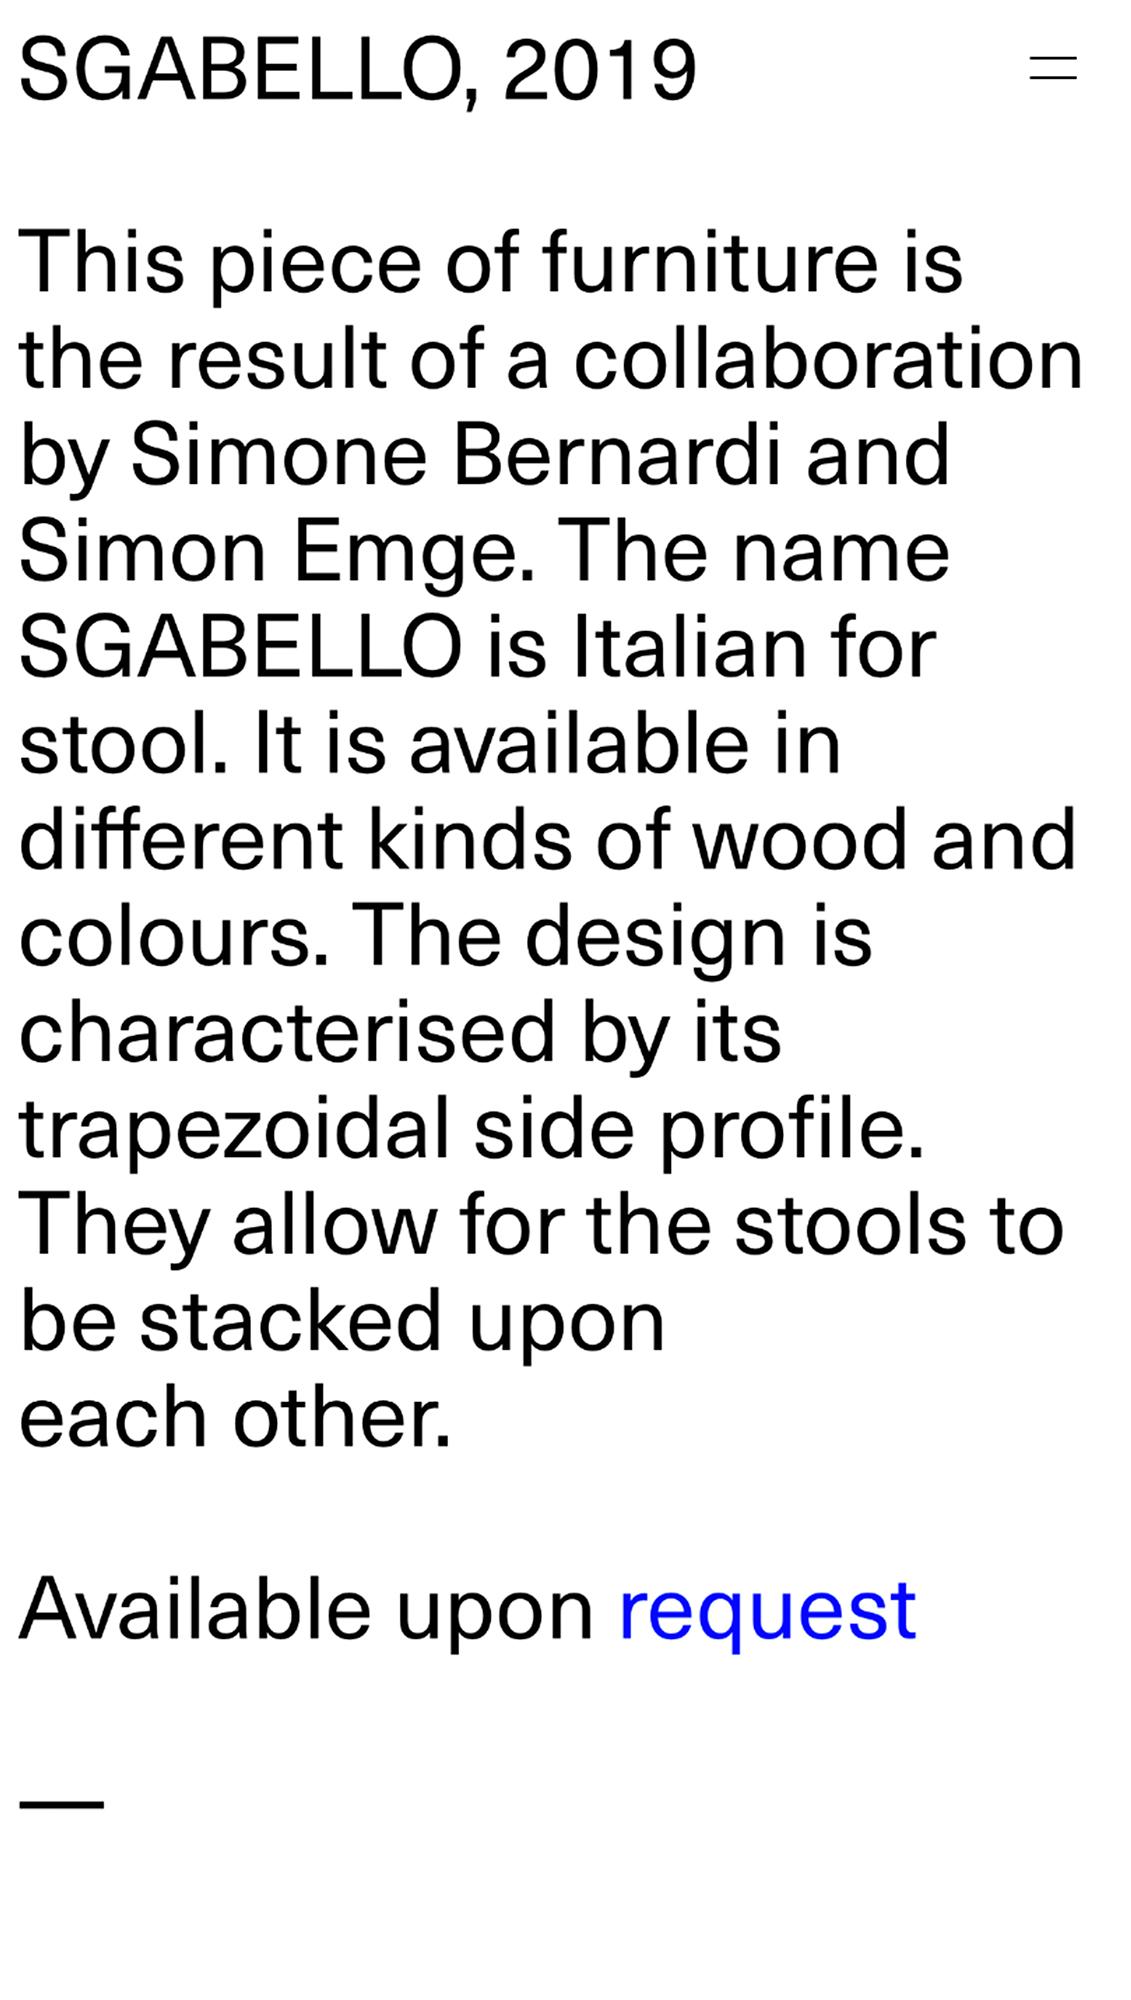 Sgabello Site 7